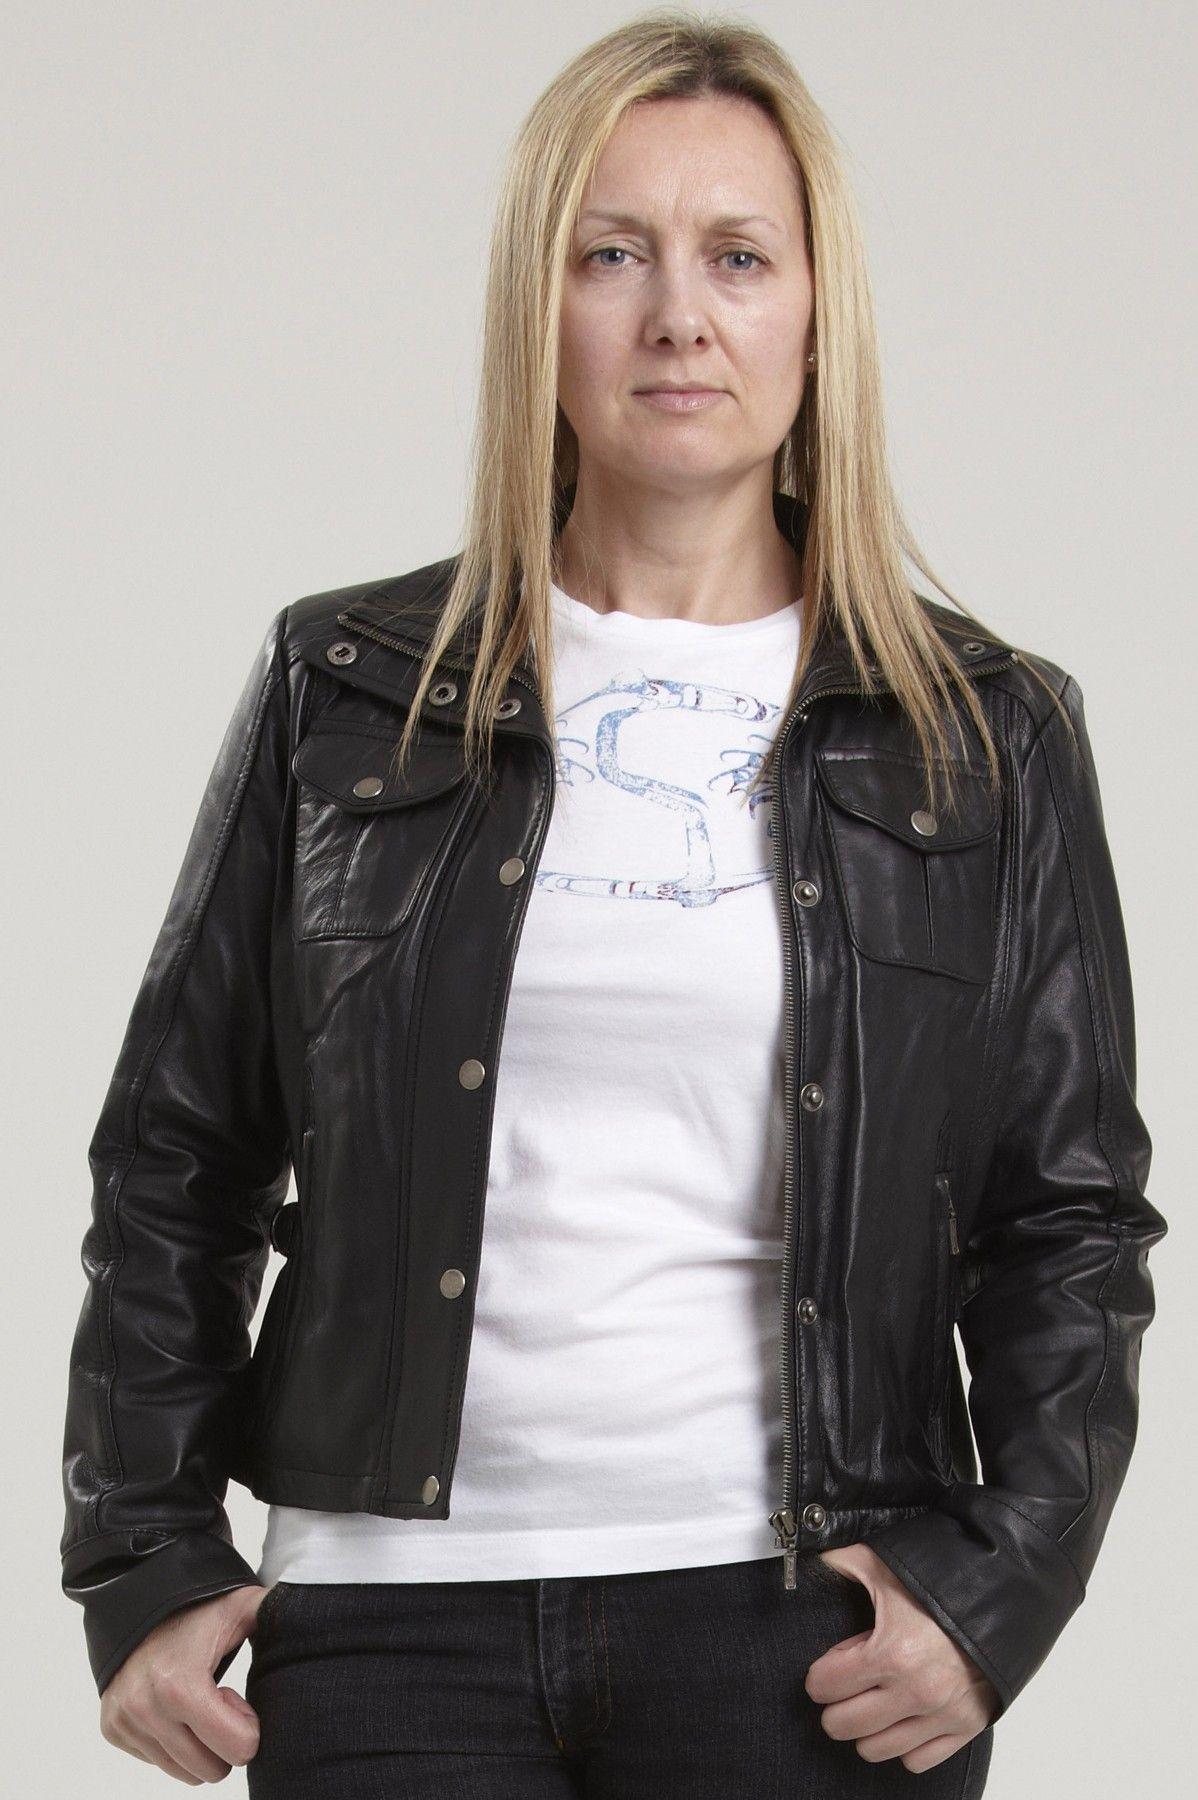 The SENA womens black leather biker jacket in real